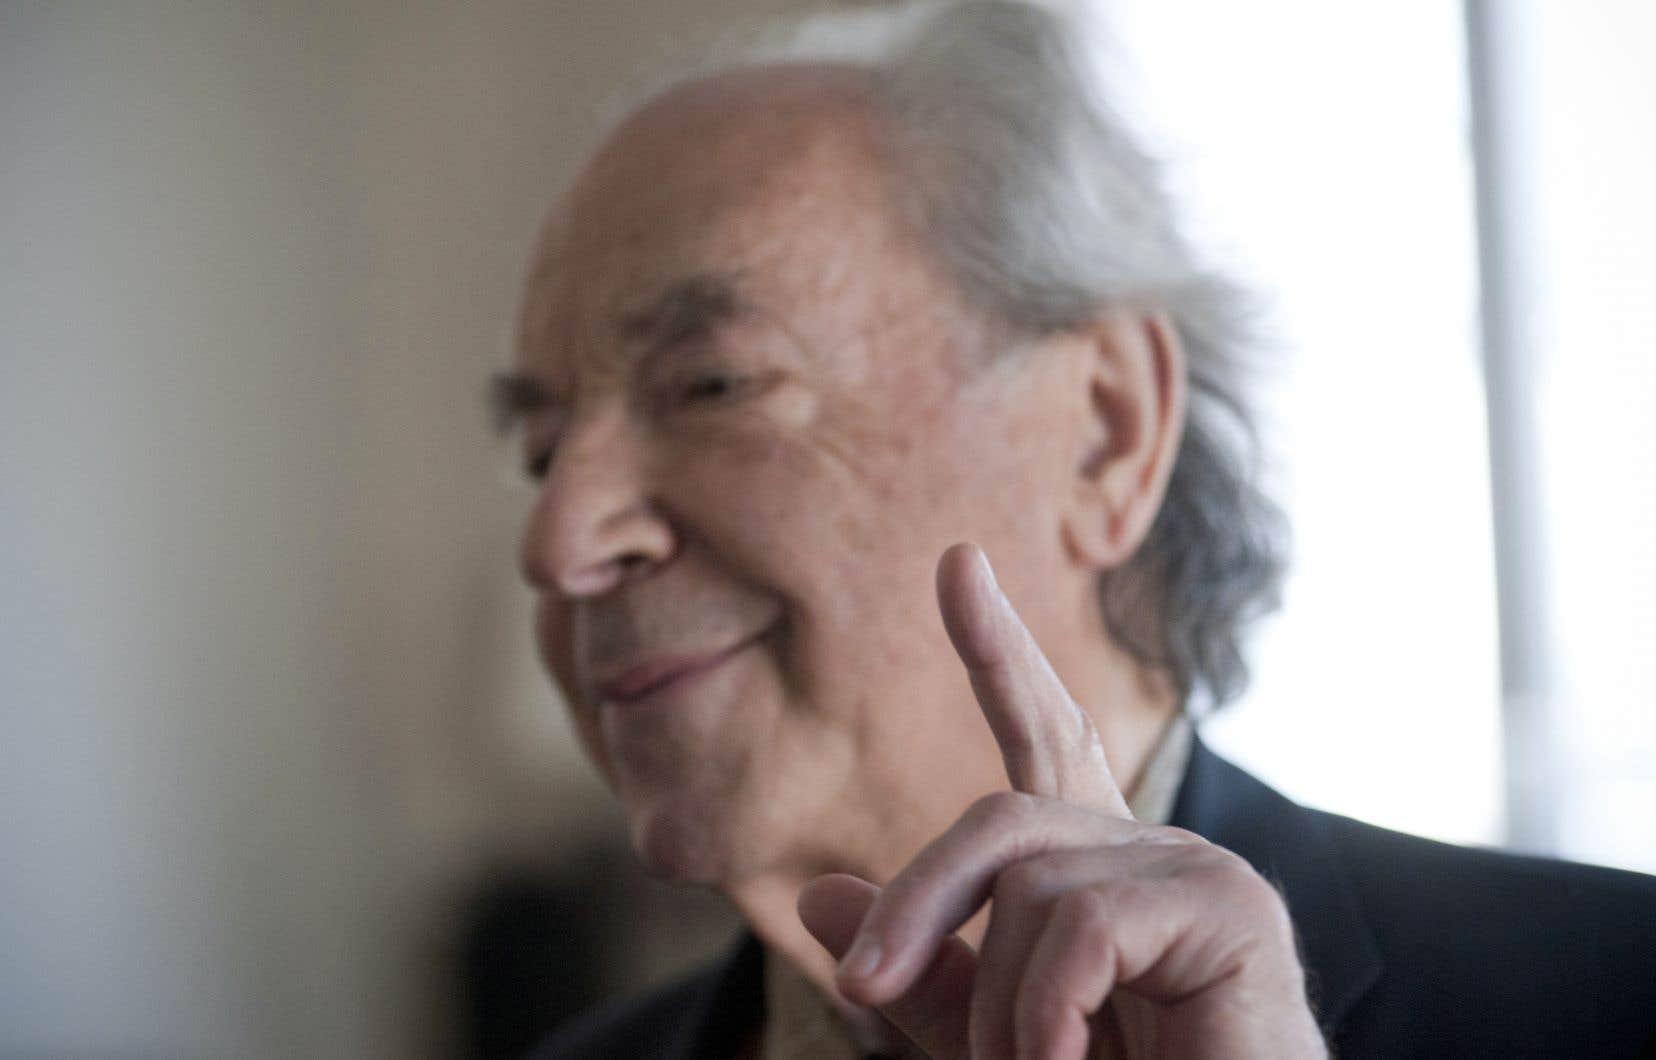 Le pianiste Paul Badura-Skoda est le dernier lien avec la grande tradition austro-allemande.